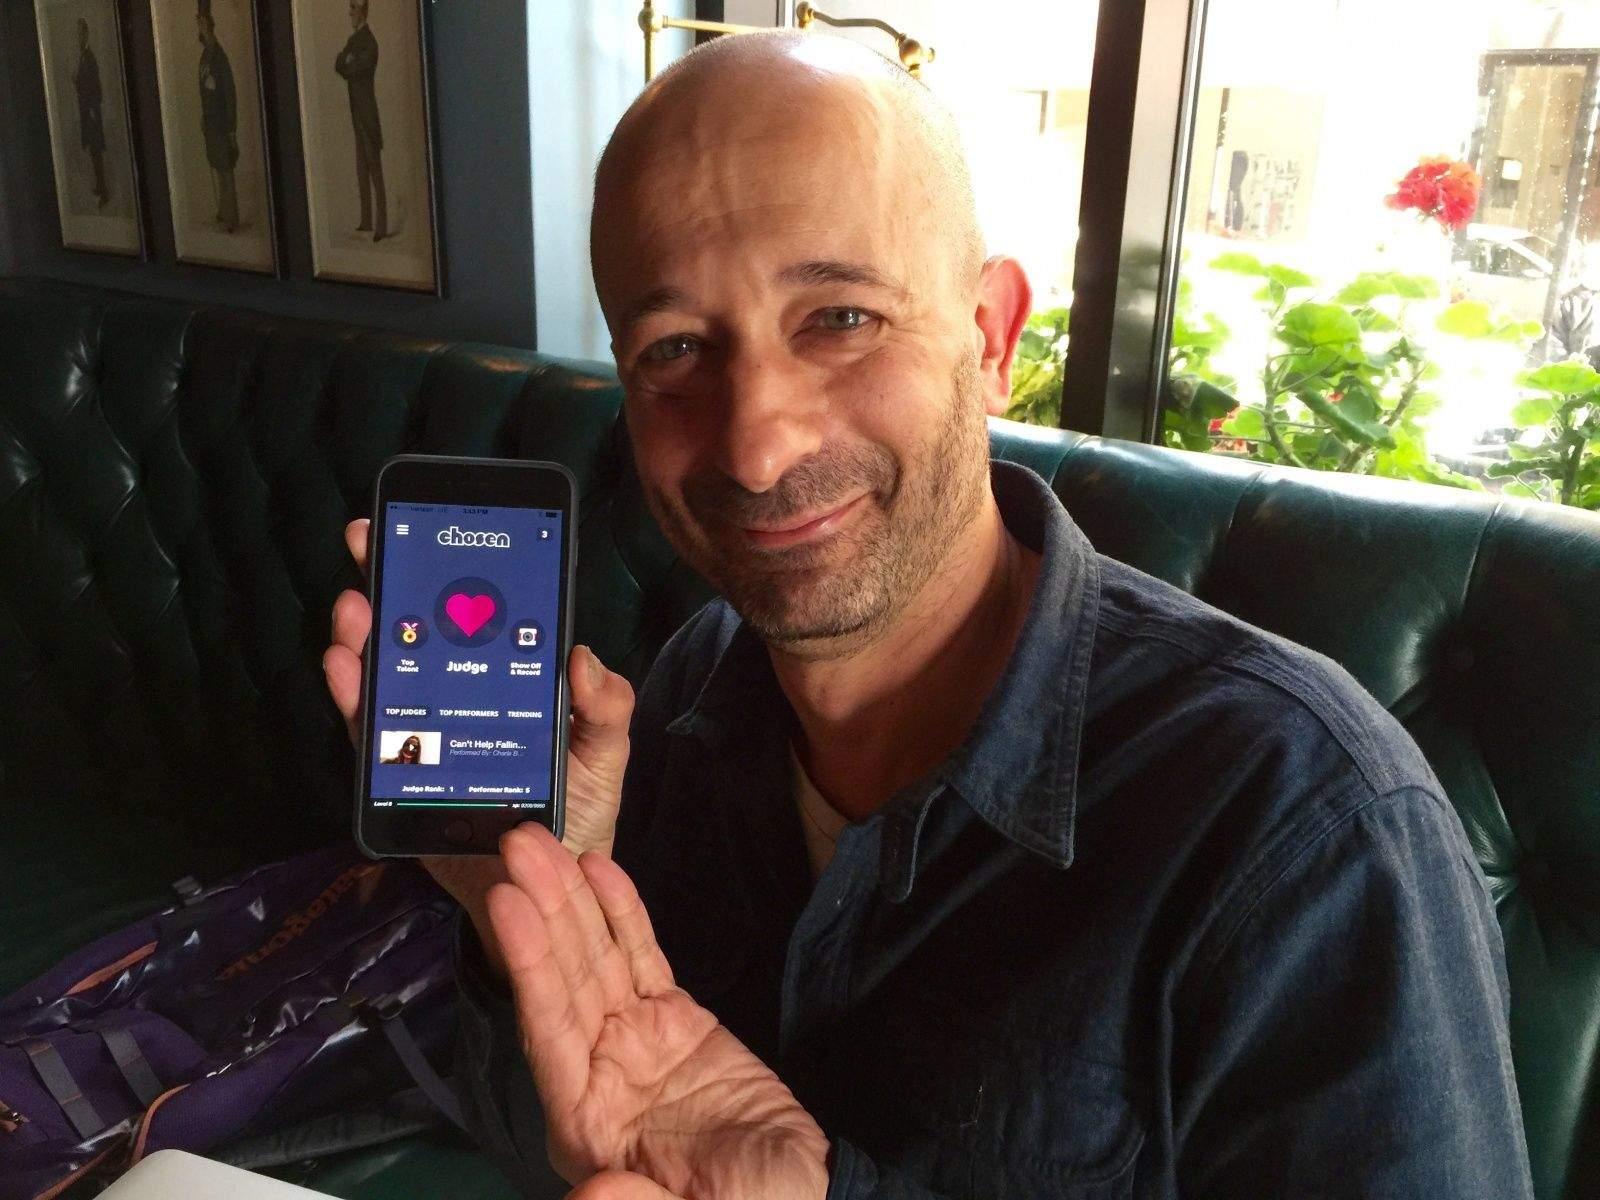 David Hyman demos his latest dream project: Chosen. Photo: Rob LeFebvre/Cult of Mac